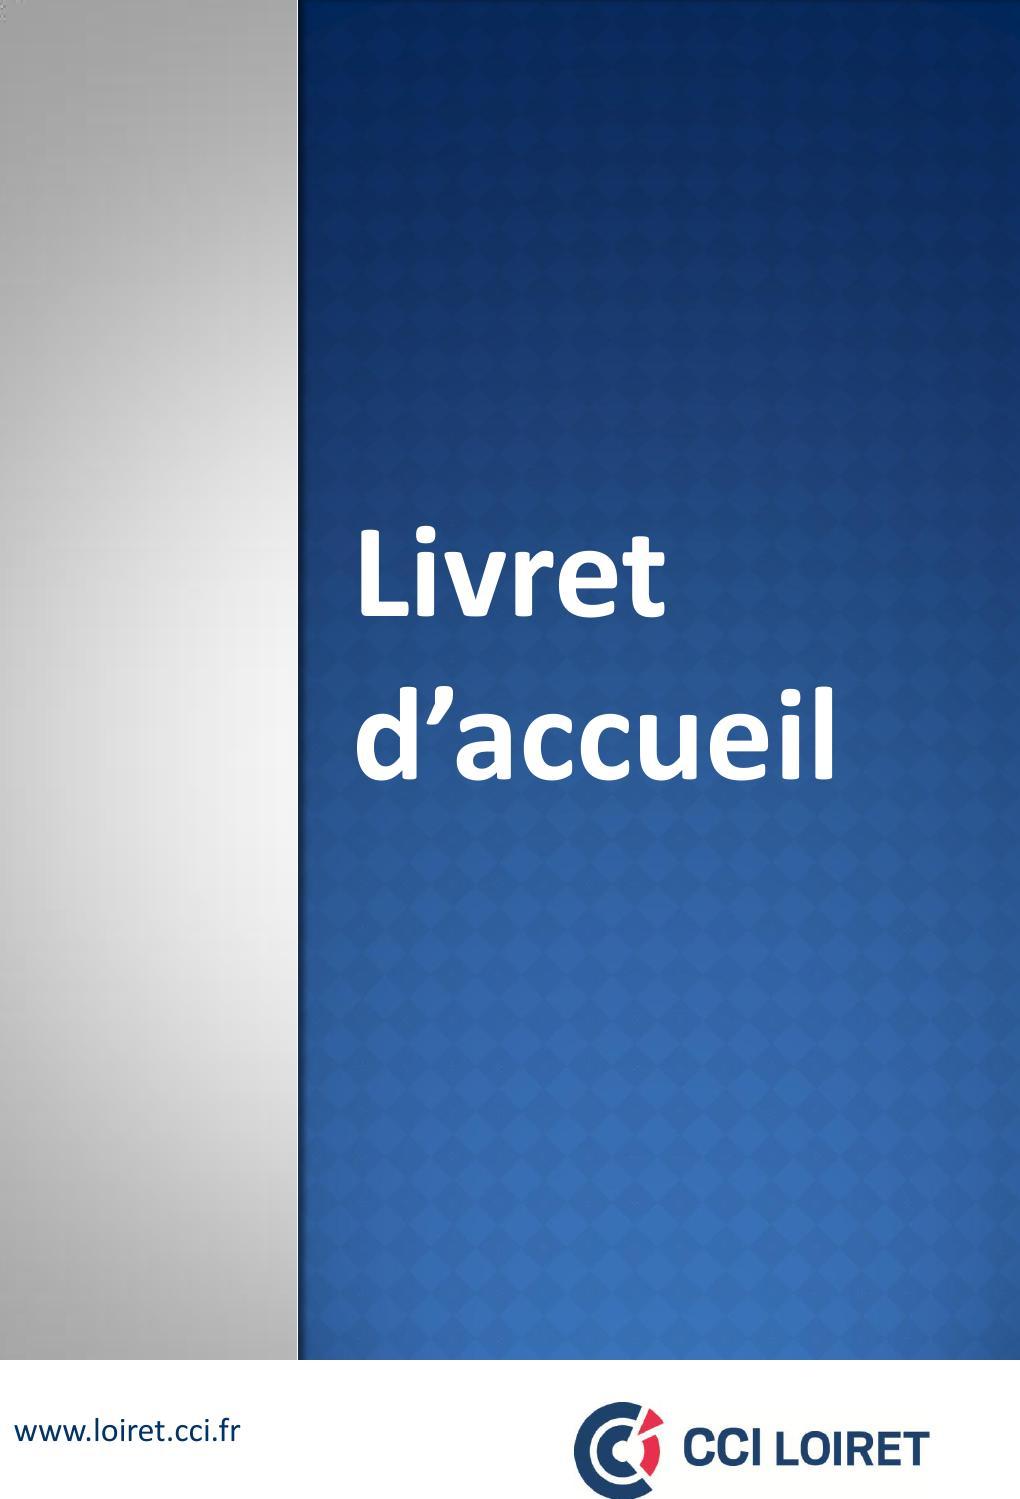 Livret d'accueil 40 by CCI territoriale du Loiret   issuu